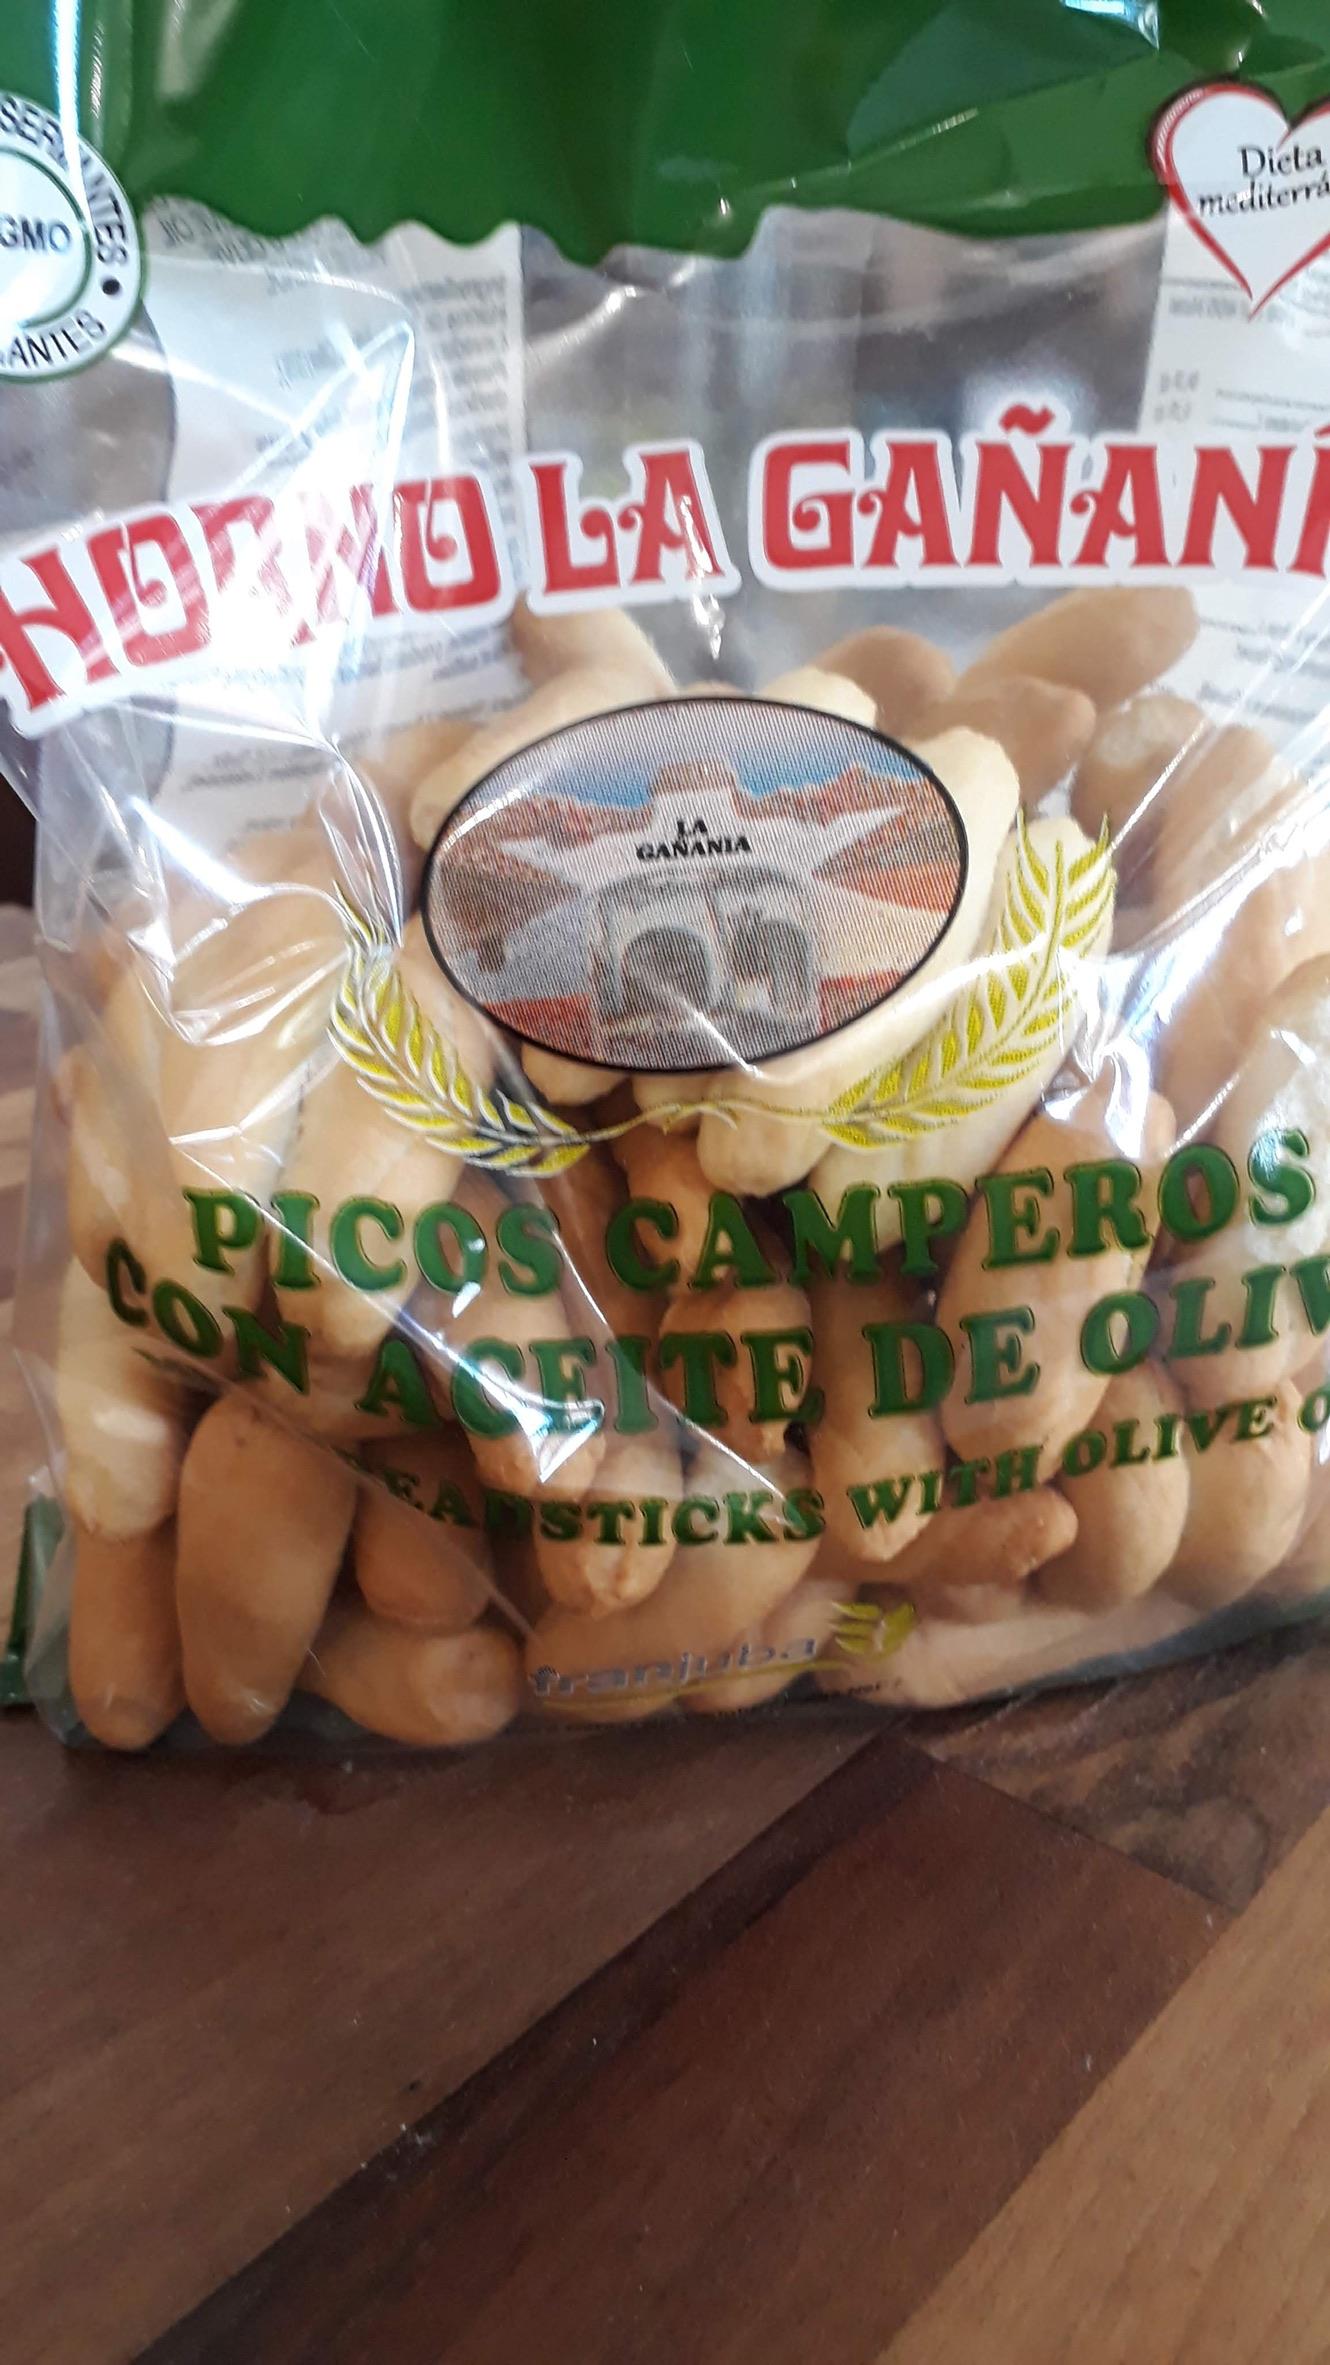 Picos de pan mini breadsticks 230g